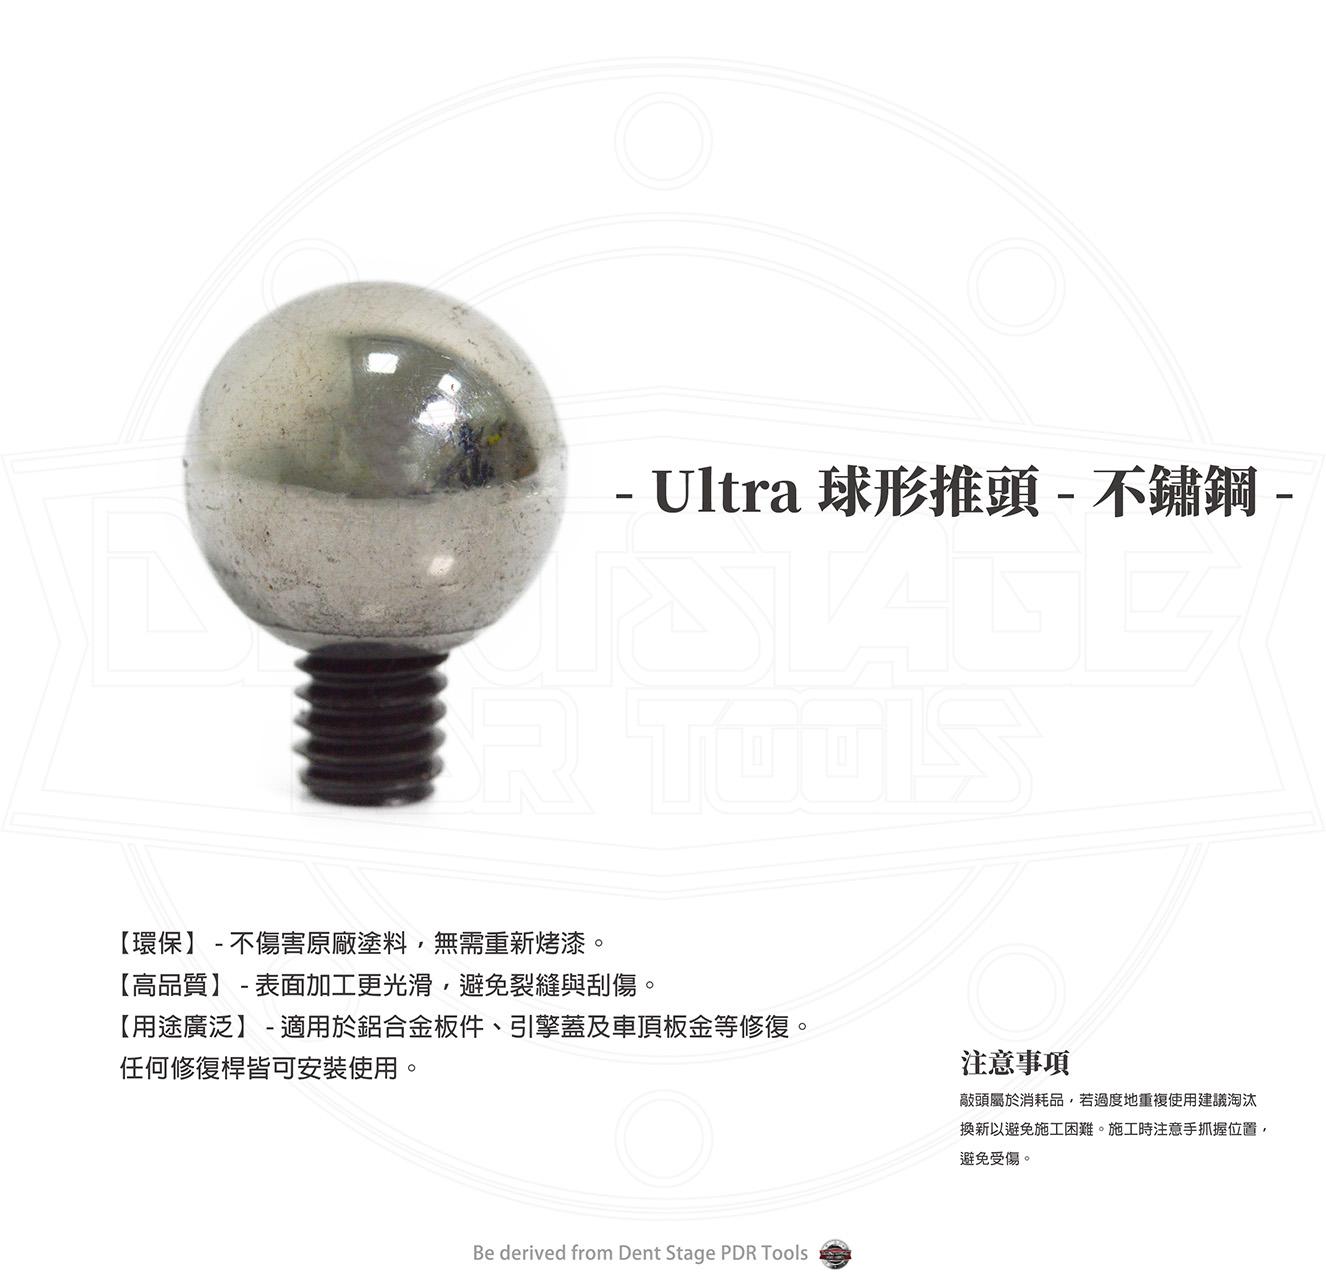 Ultra 球形推頭 - 不鏽鋼_02.jpg